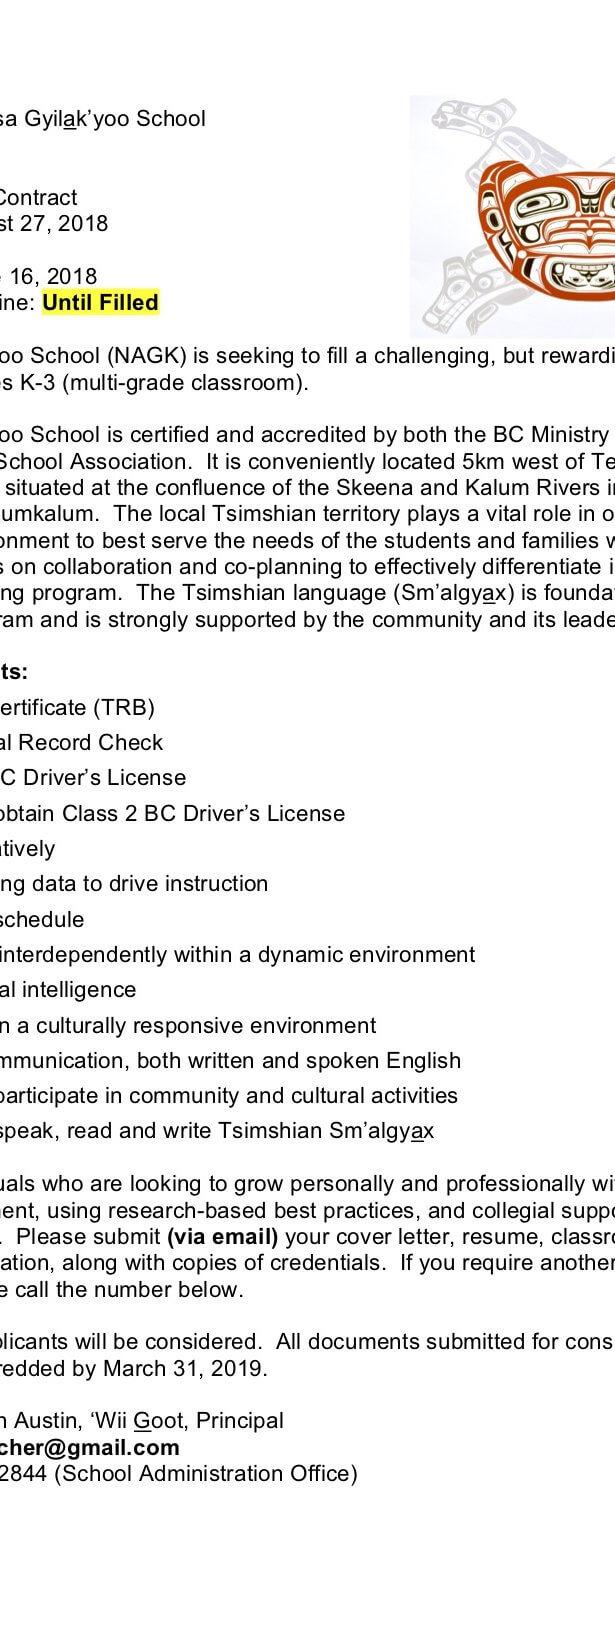 Employment & Training Services | Kitsumkalum, a Tsimshian Community